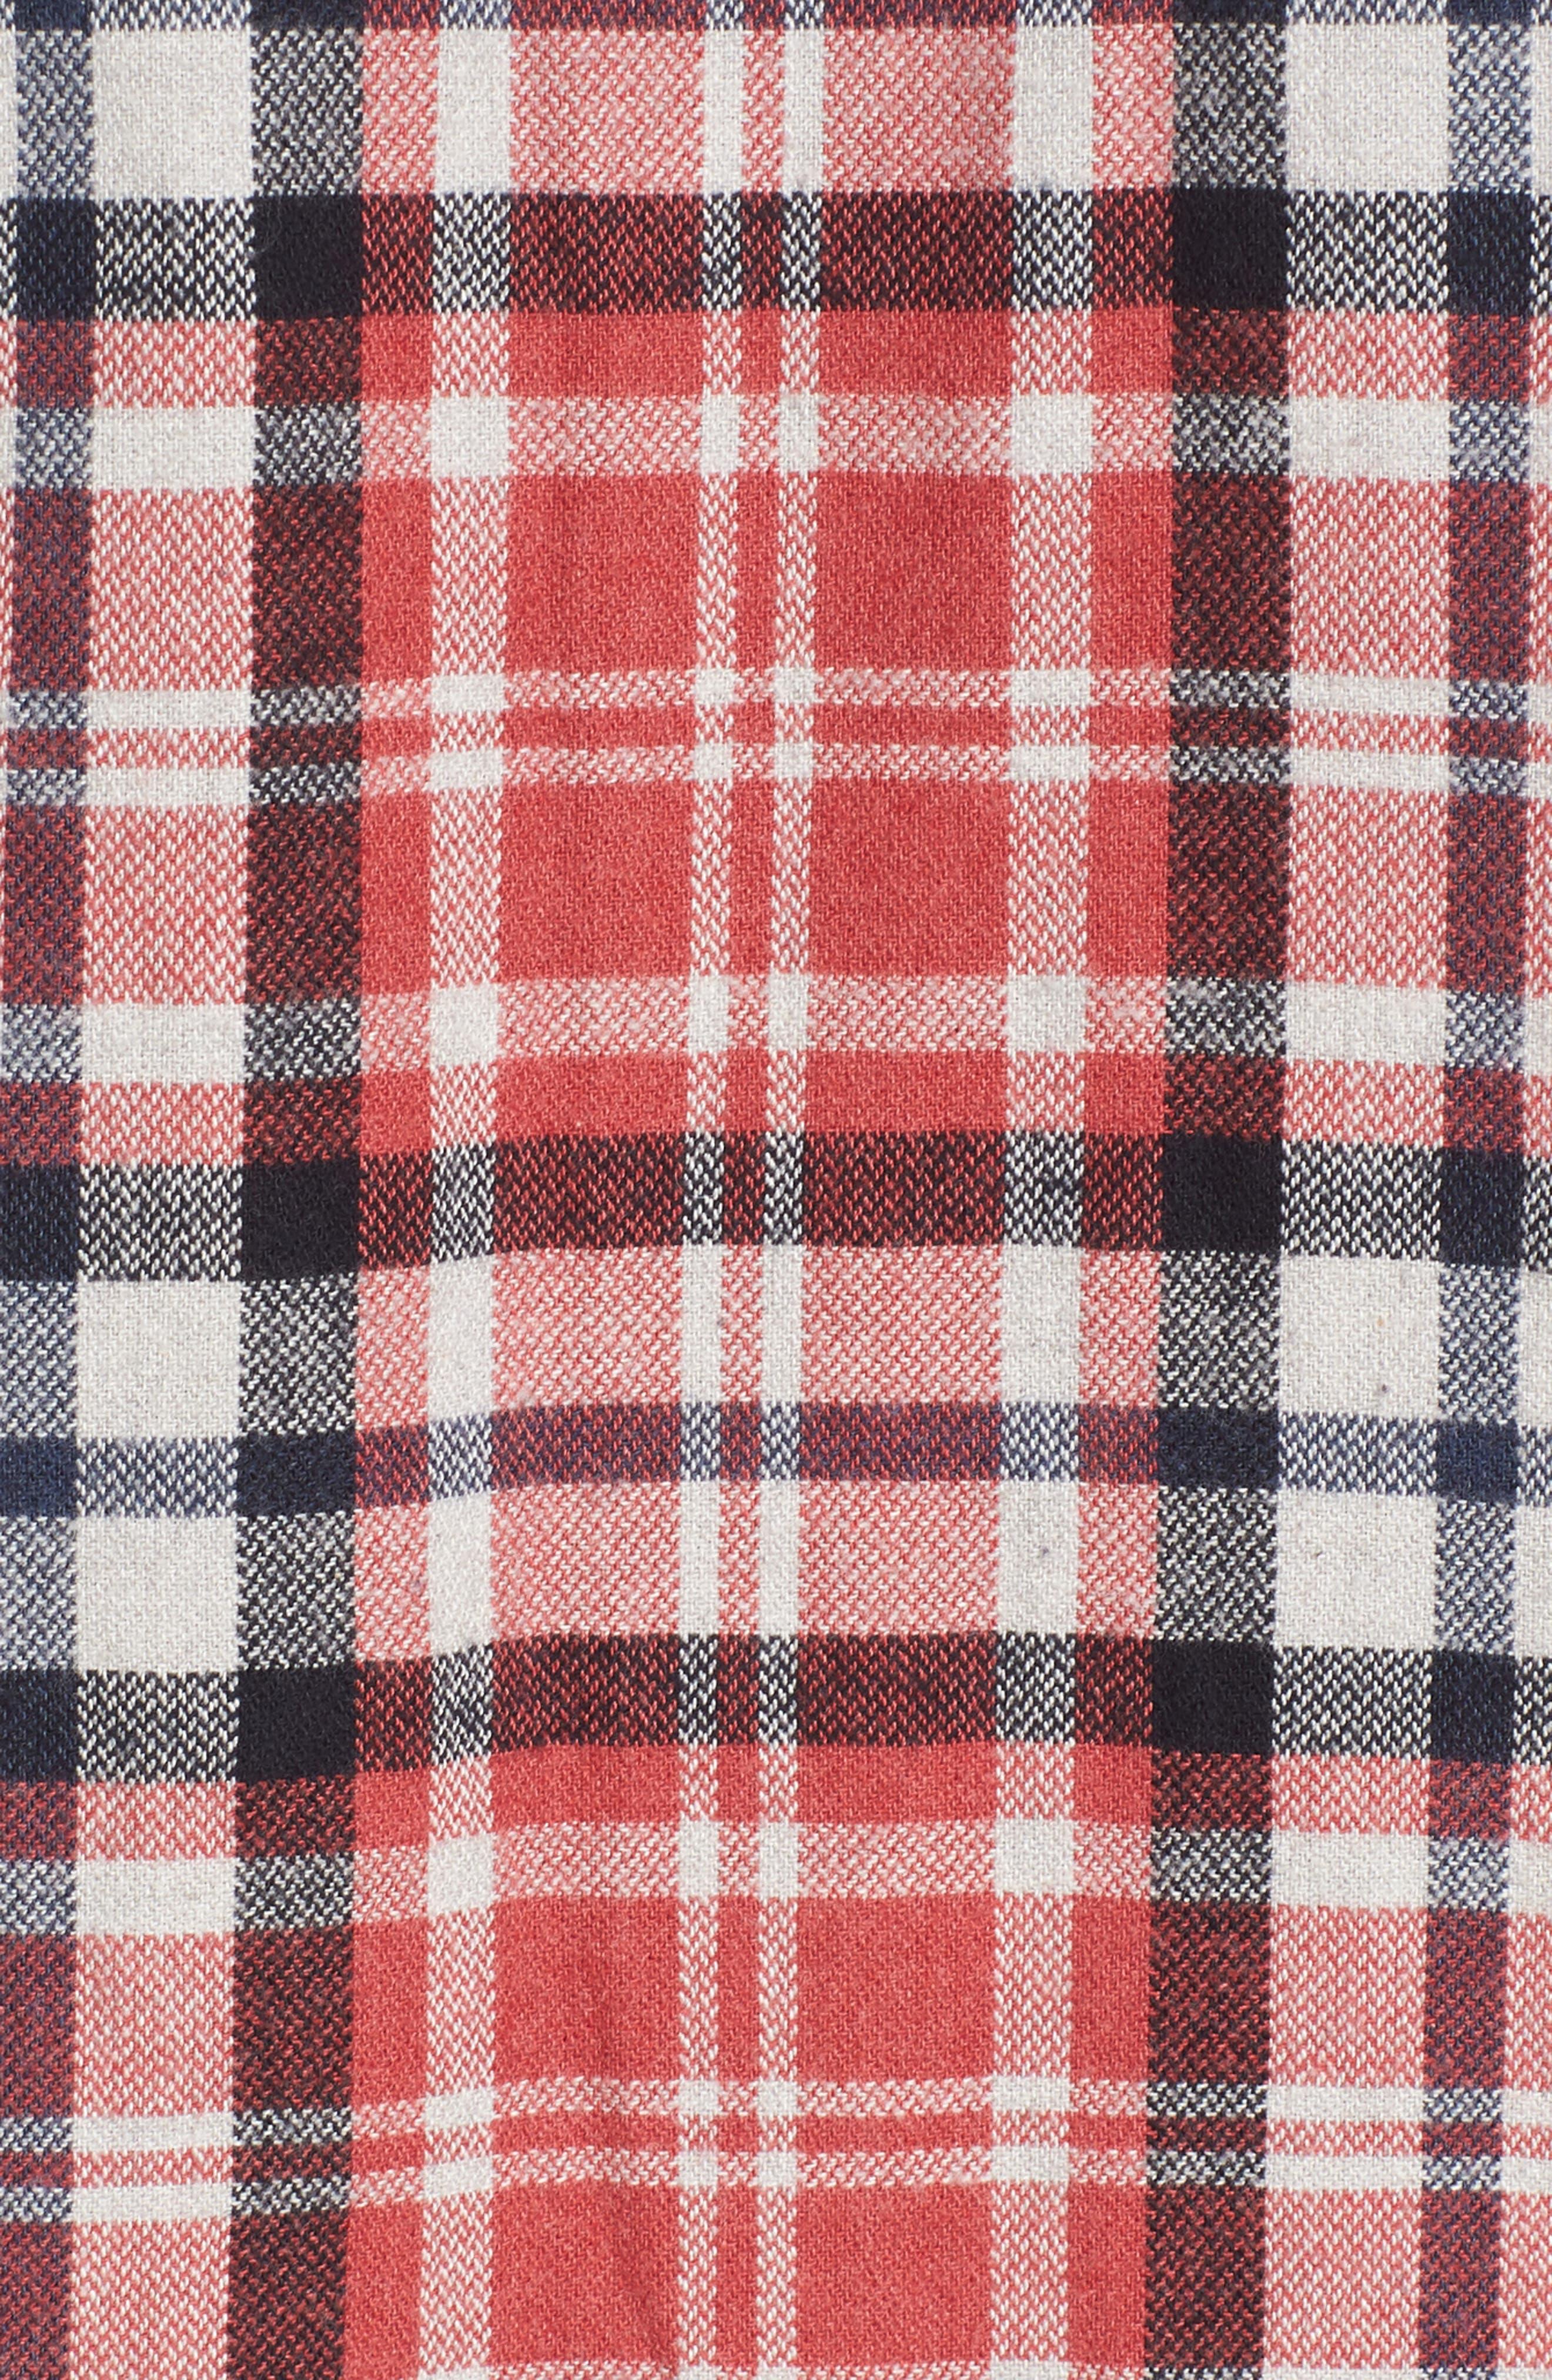 Brampton Textured Plaid Flannel Shirt,                             Alternate thumbnail 5, color,                             Red Stone Navy